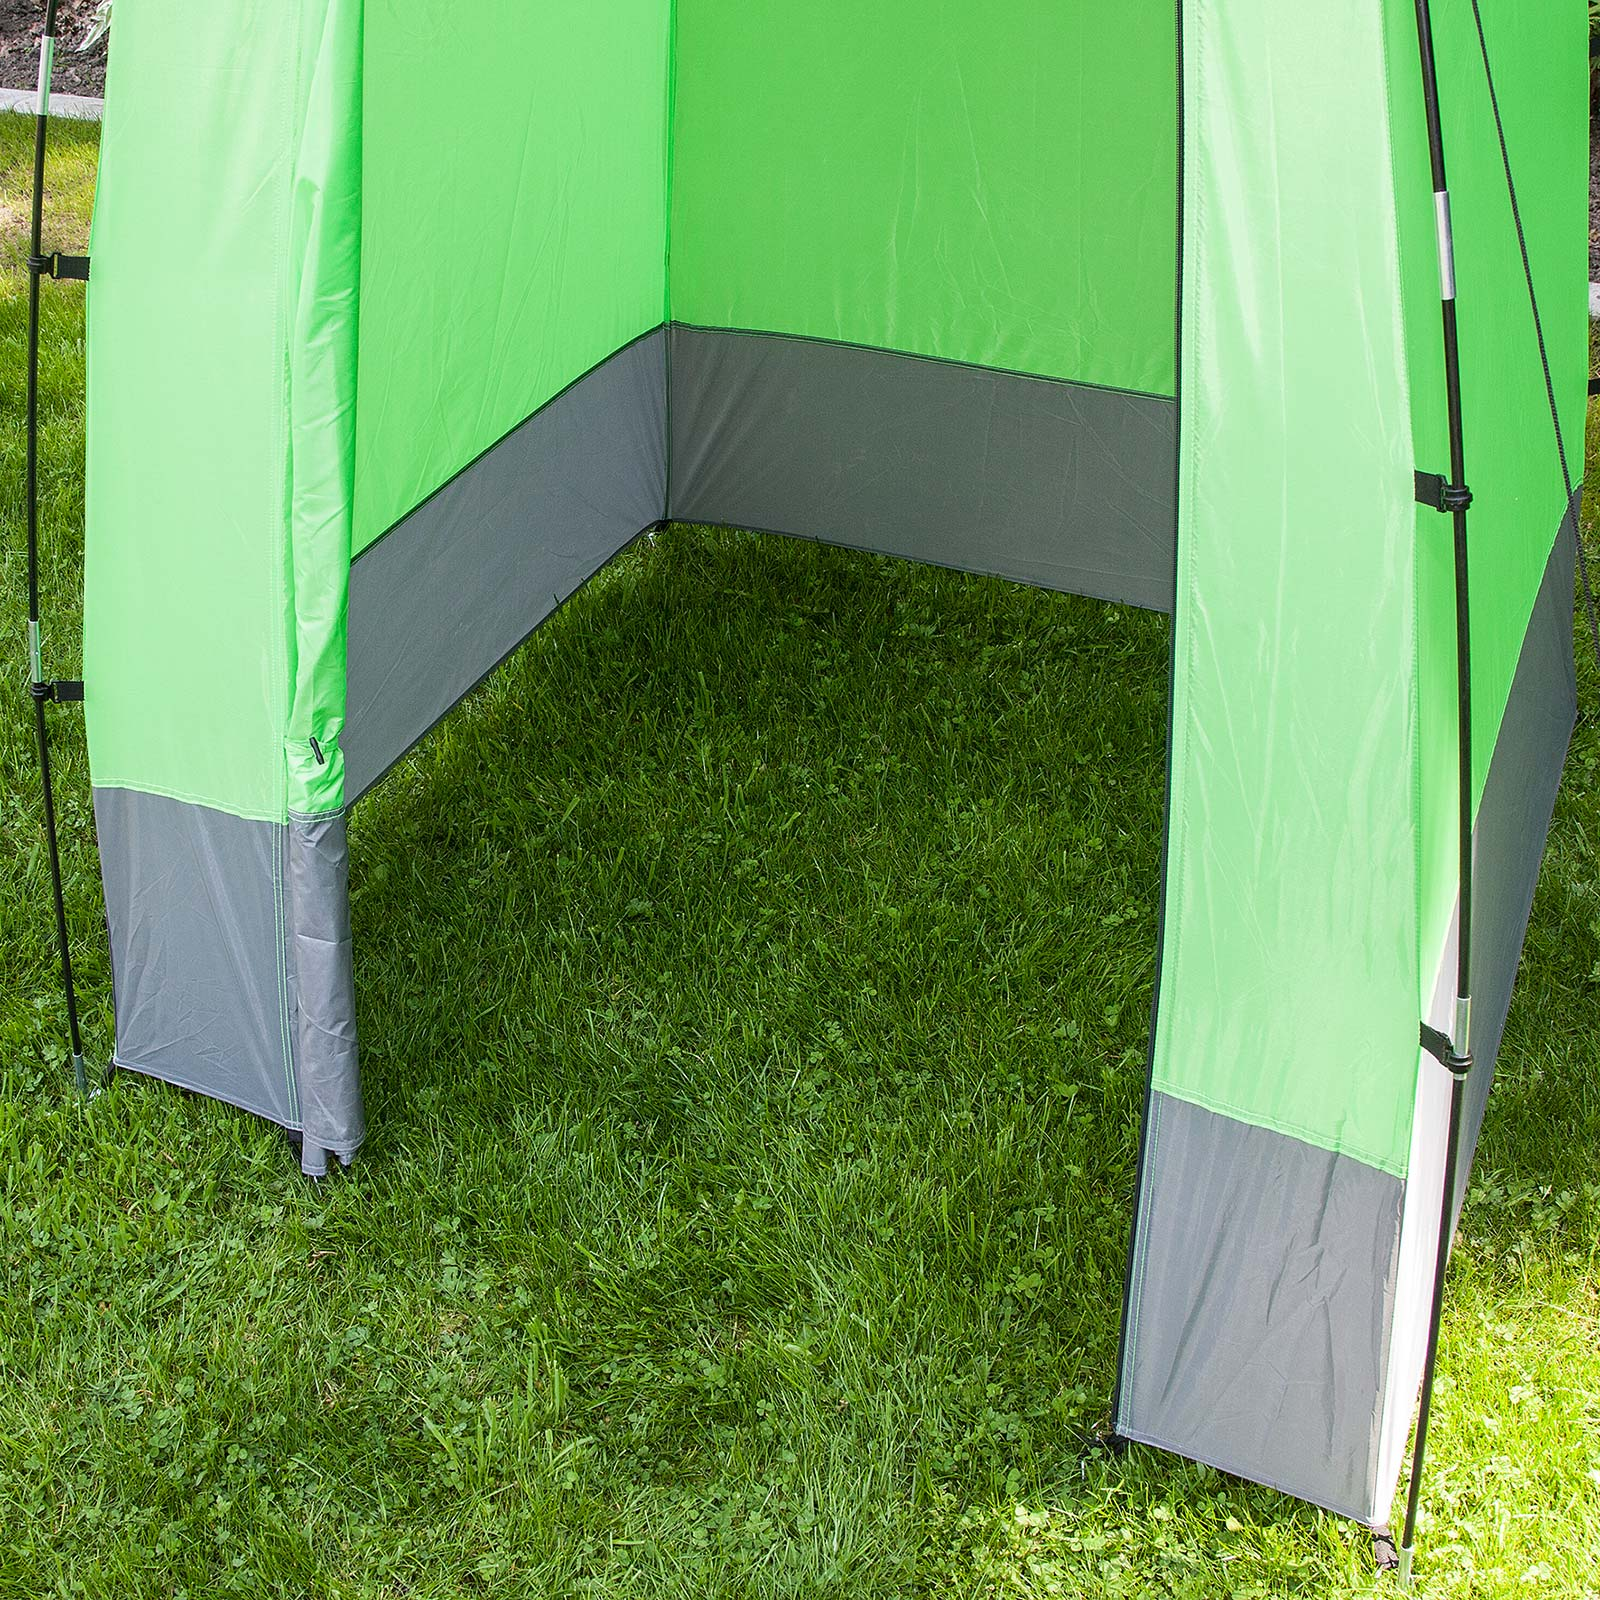 skandika tente cabine douche toilette camping 130x130cm verte neuve ebay. Black Bedroom Furniture Sets. Home Design Ideas